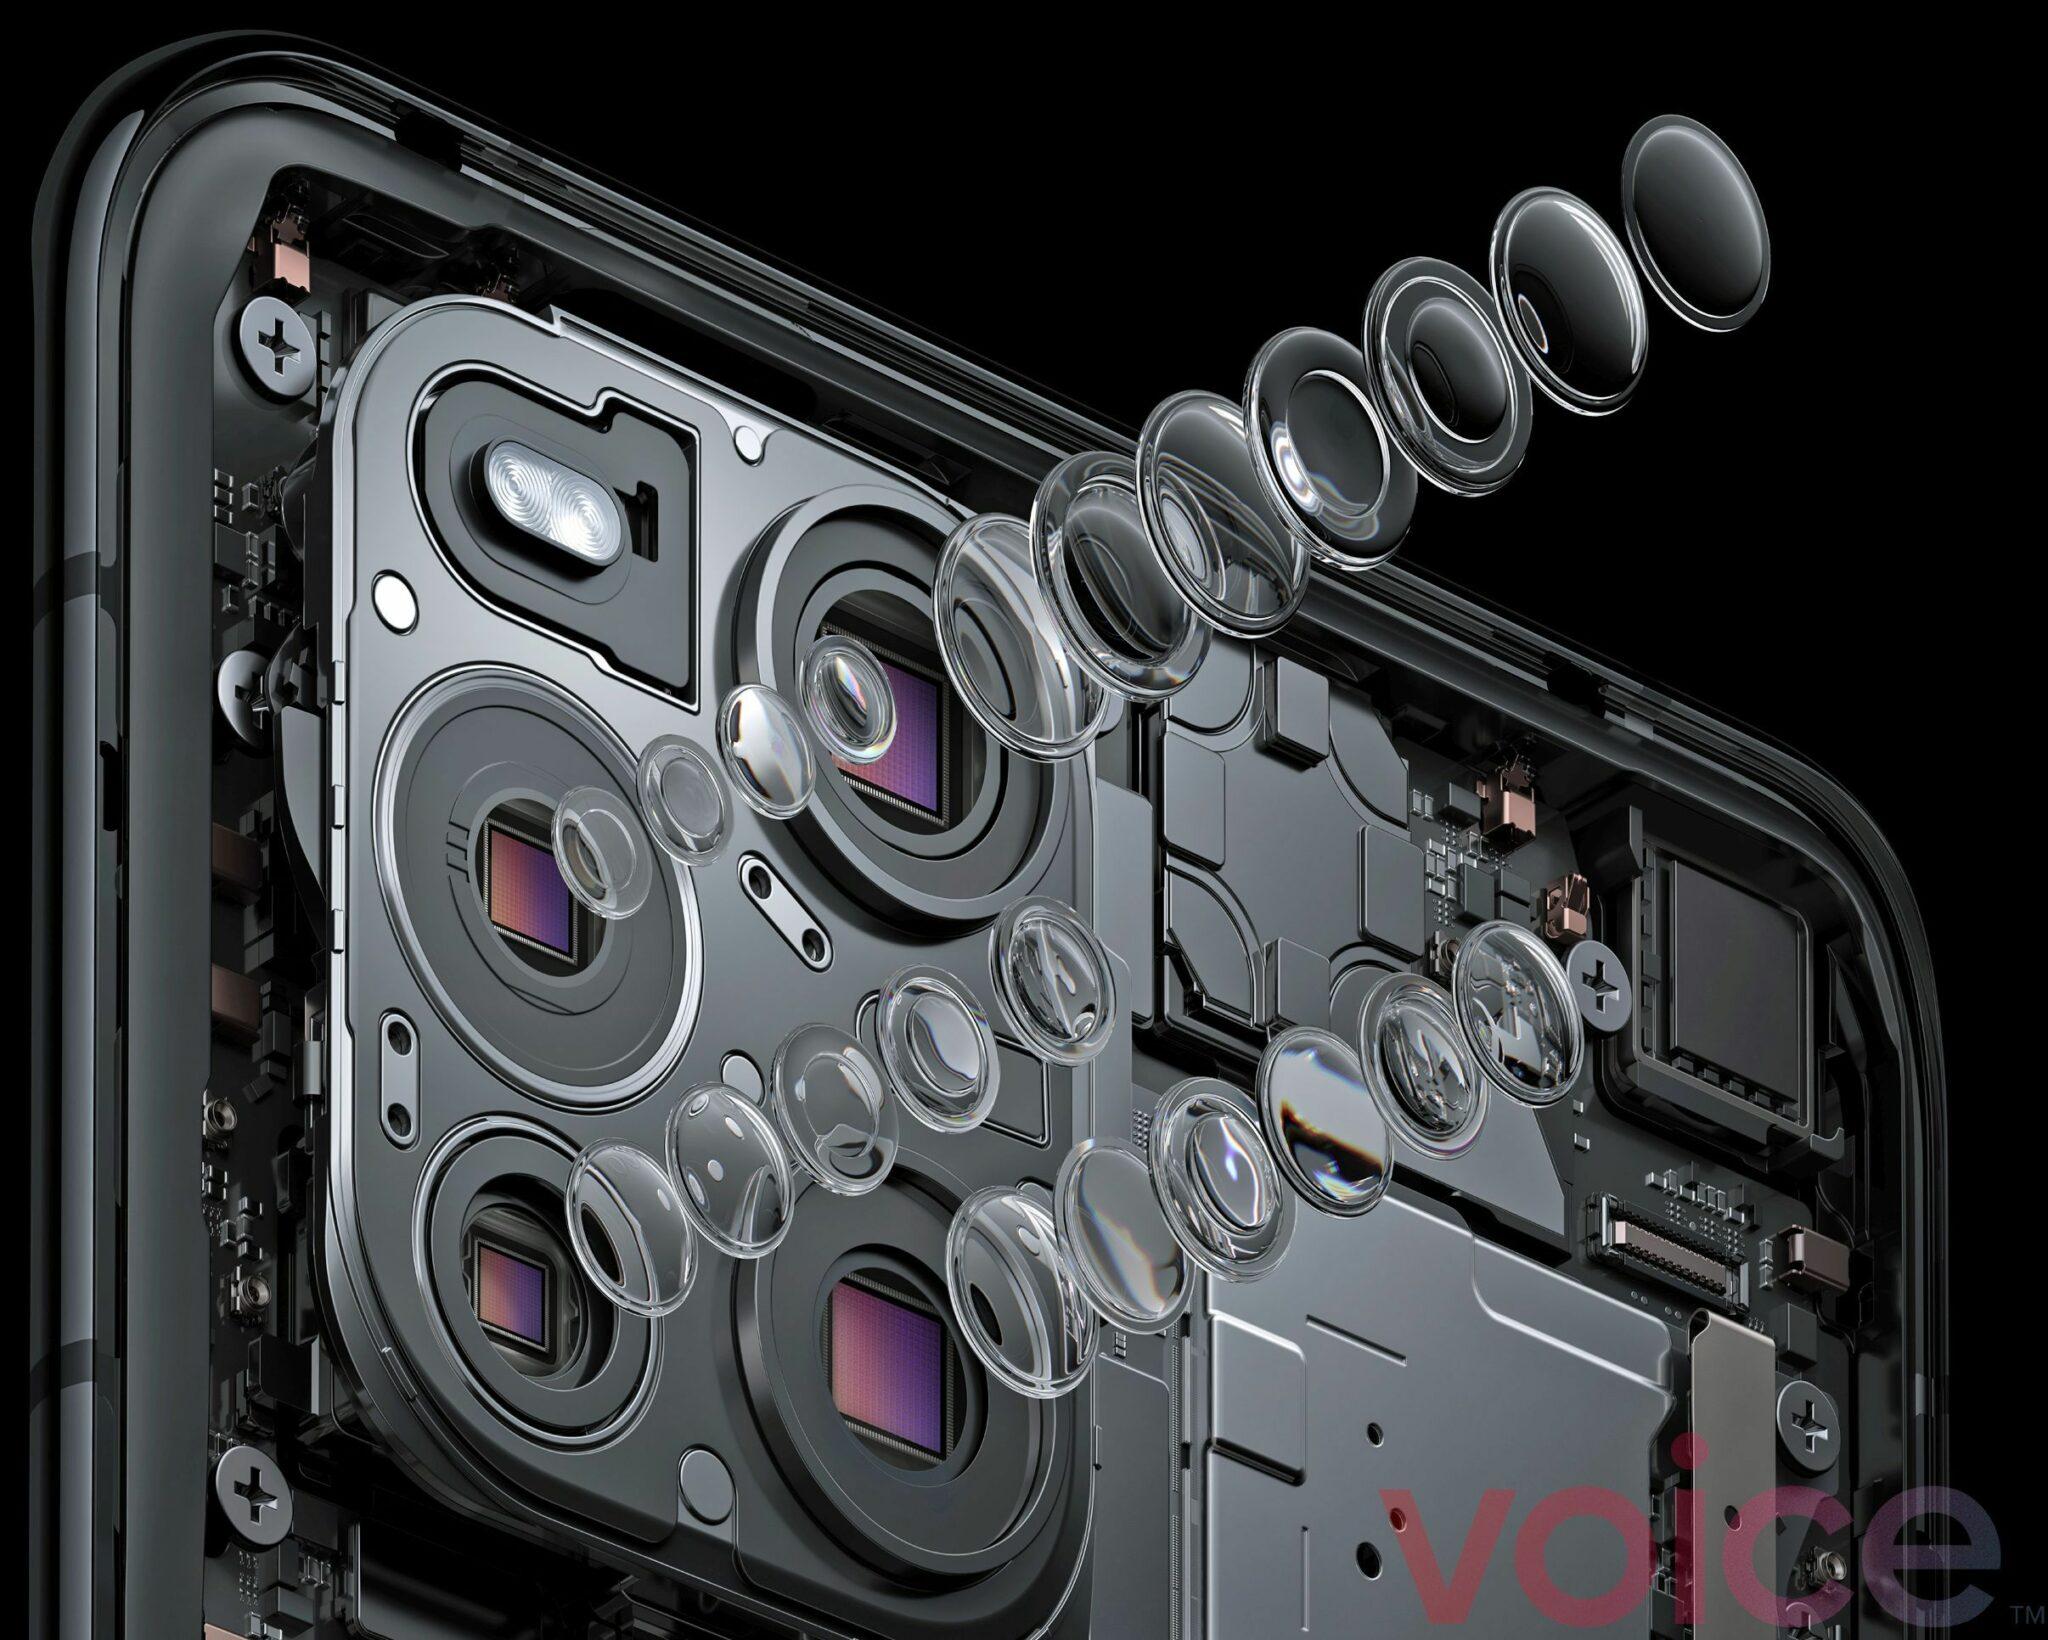 OPPO Find X3 Pro Evan Blass Voice Leak Kamera